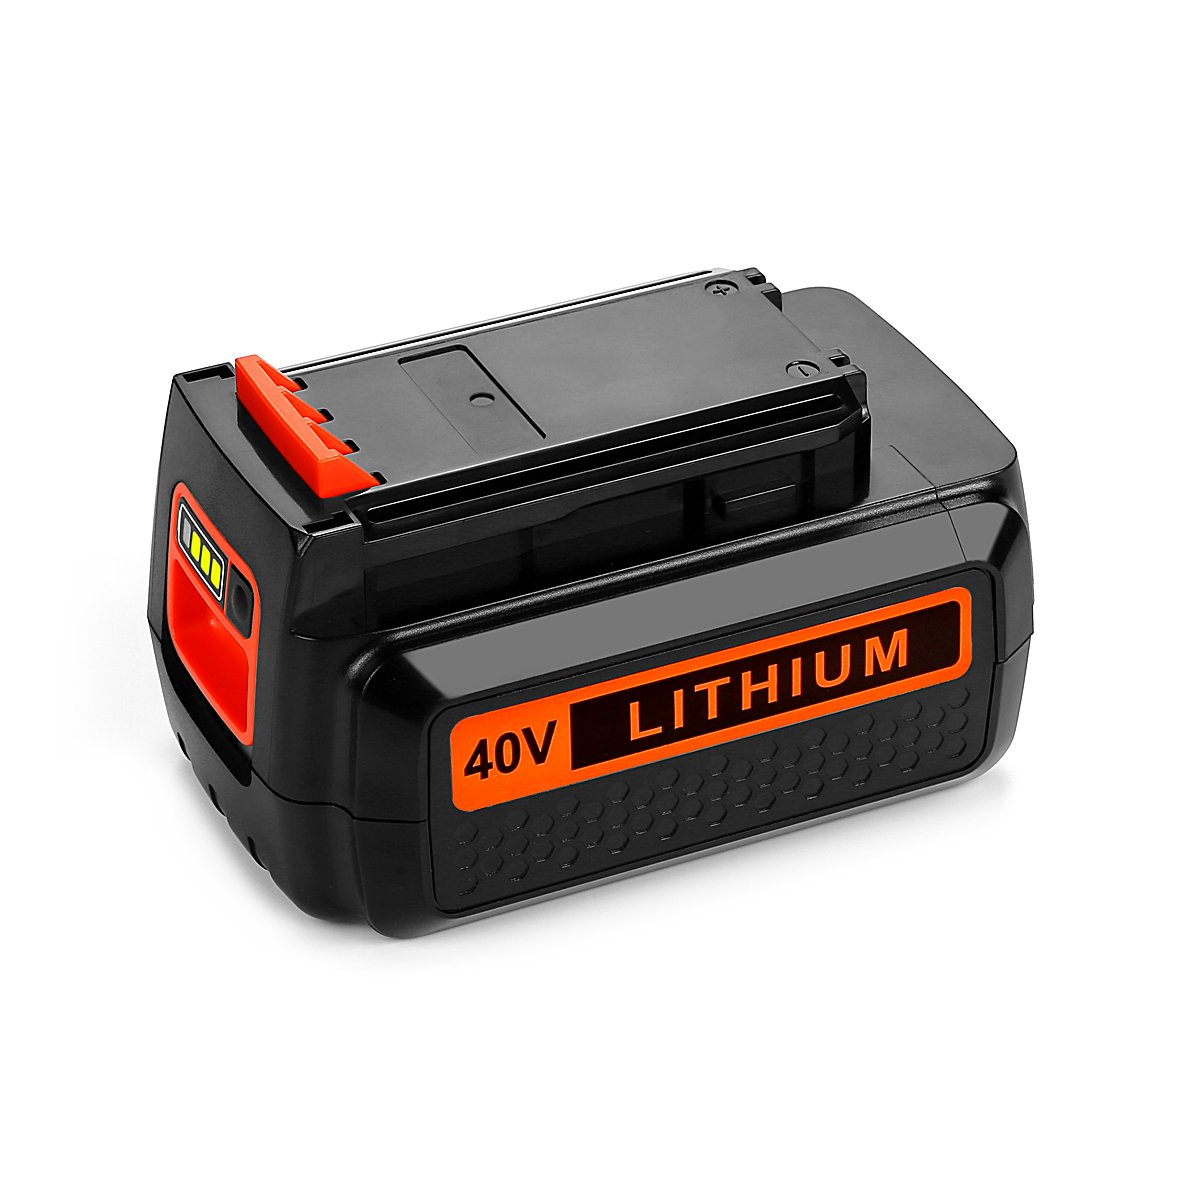 Energup 40 Volt MAX 2.0Ah Replacement Battery for Black&Decker LBX2040 LBX36 LBXR36 LBXR2036 40V Lithium Ion Battery